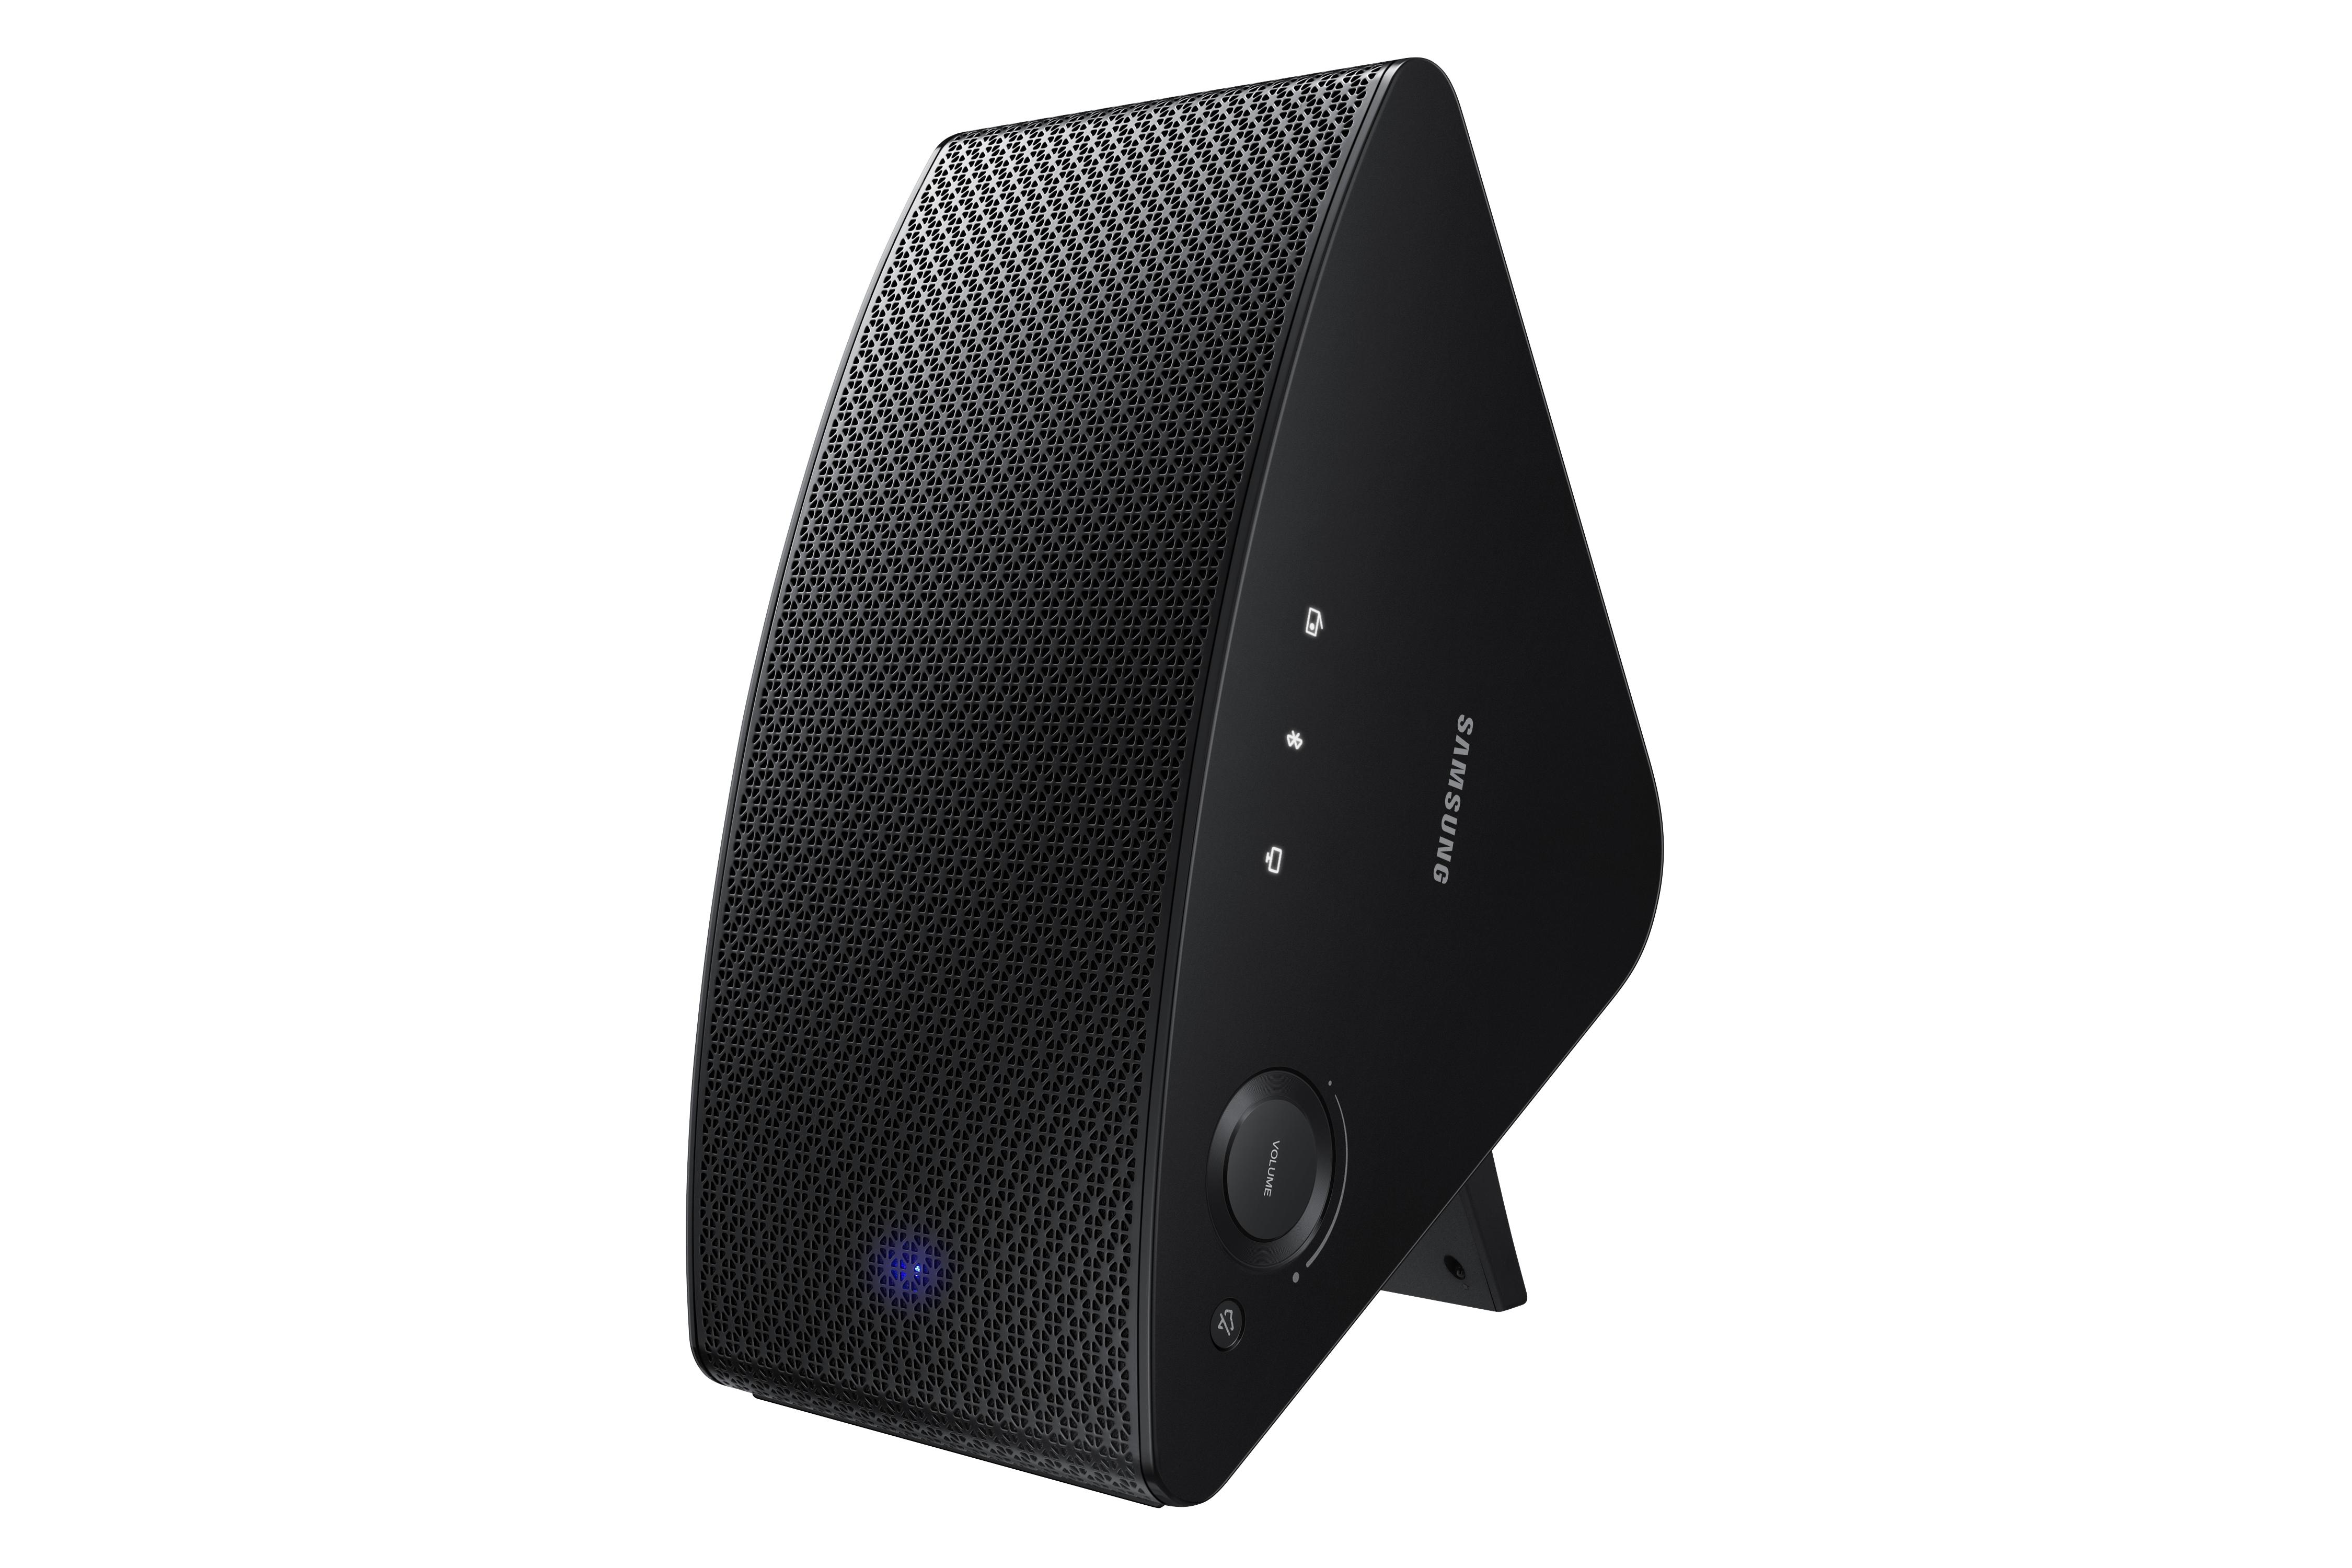 Samsung Wireless Multiroom Speakers Wire Center Opamp Pulsewidth Modulator Circuit Diagram Tradeoficcom Expands Its Premium Home Audio Lineup With A Compact Shape Rh Businesswire Com Wam1500